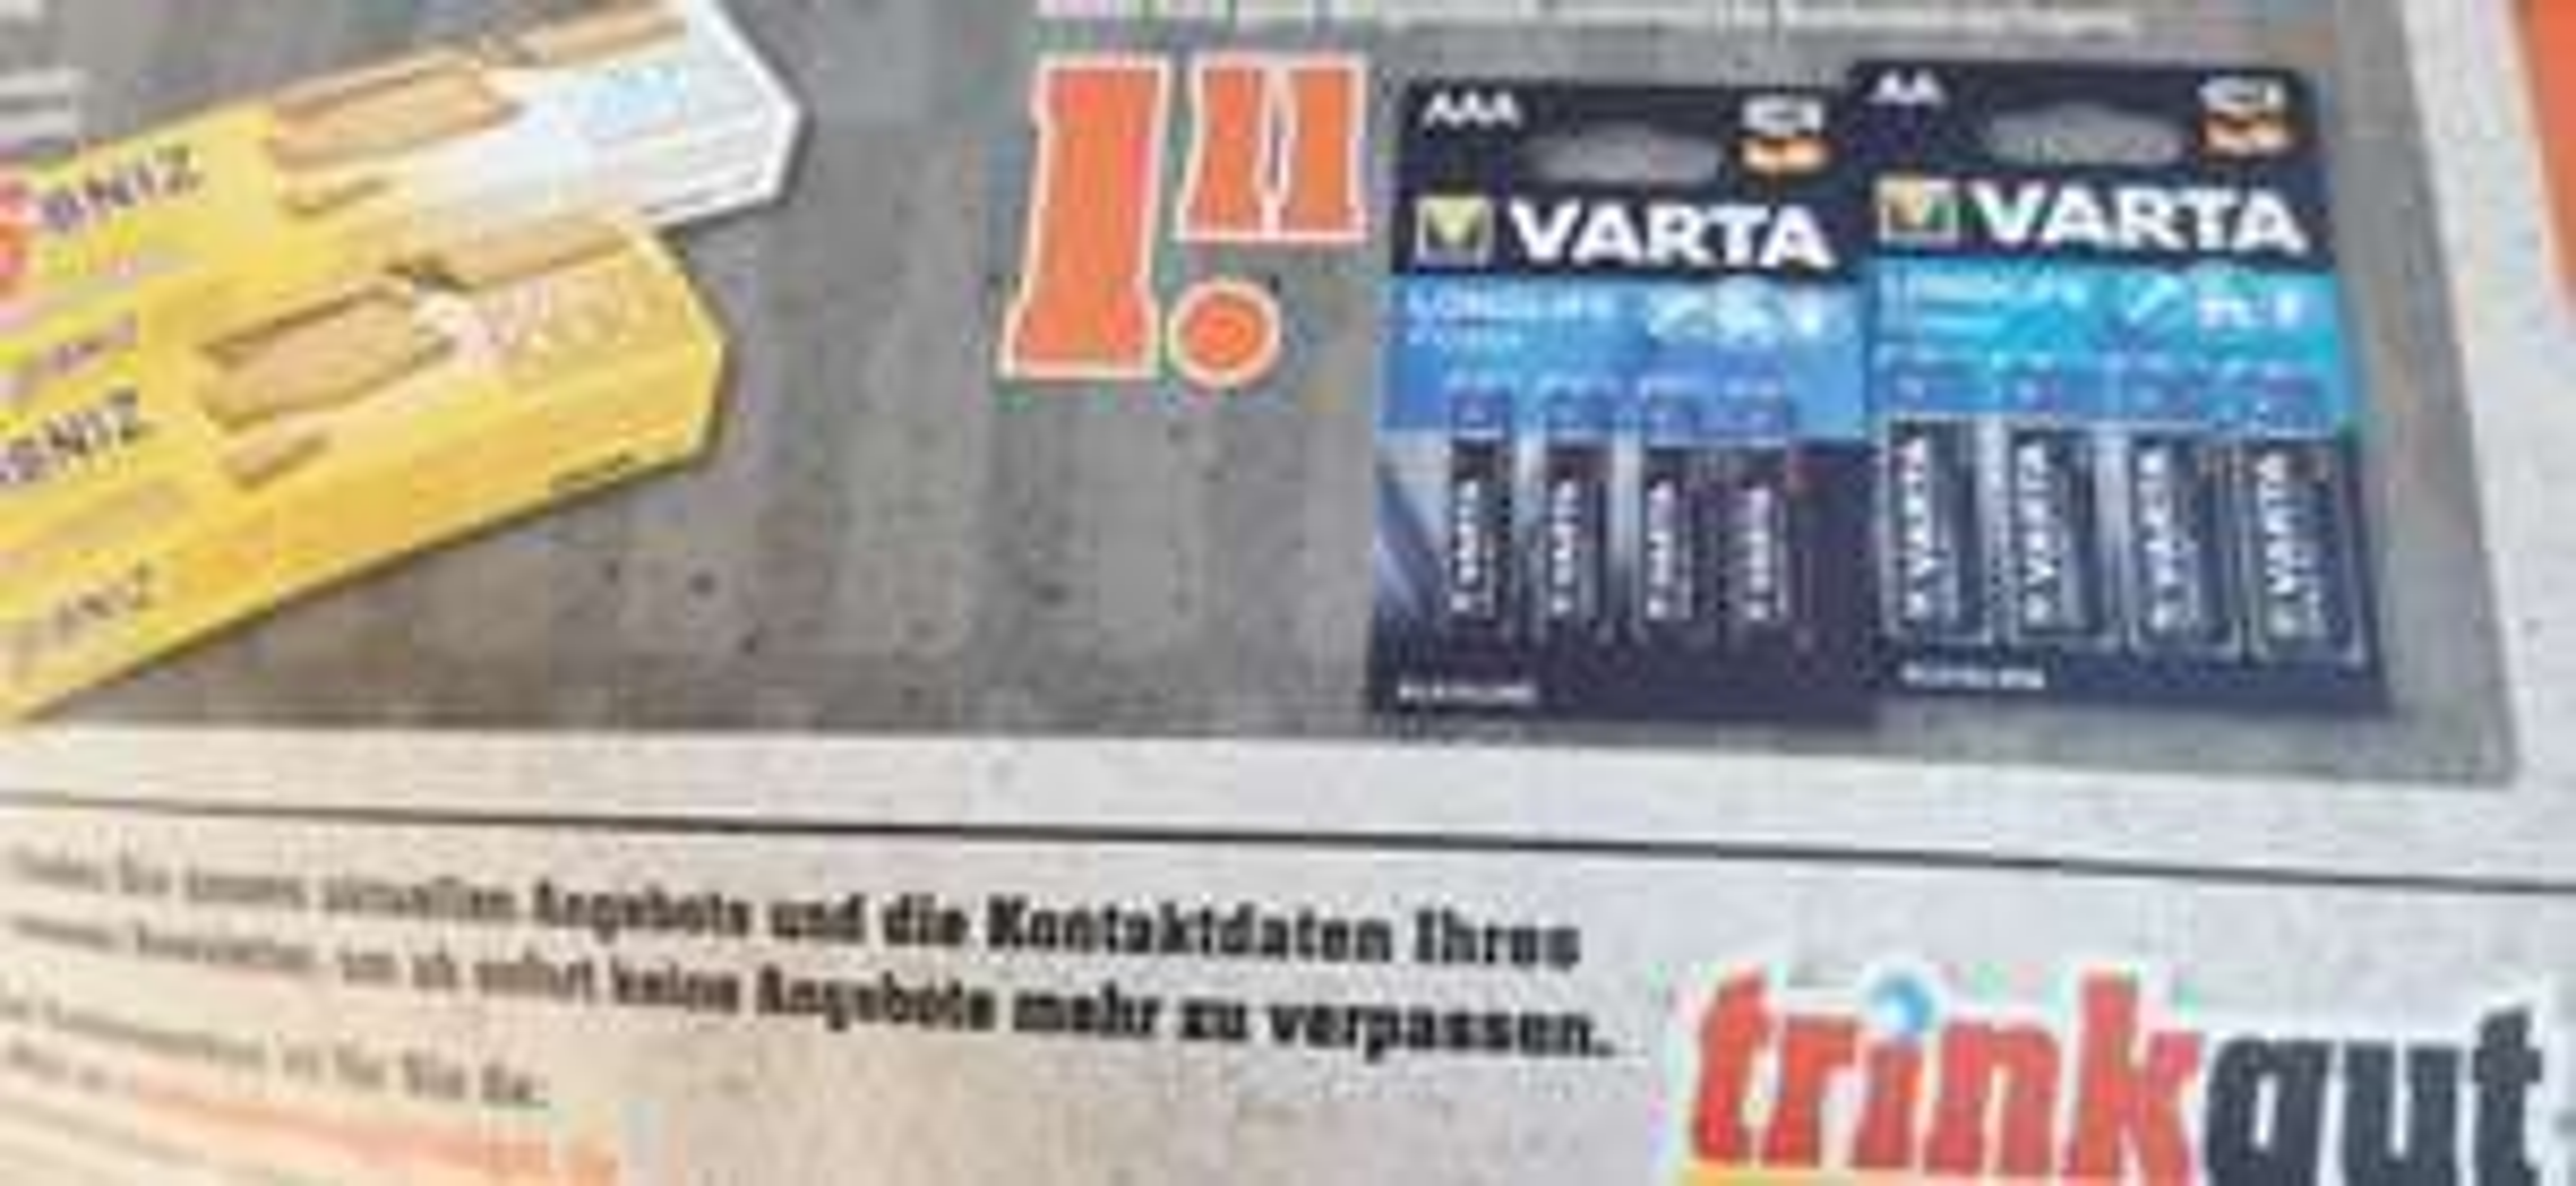 Batterie AA / AAA 4 Stück VARTA LONGLIFE POWER TRINKGUT AB 18.01.2021